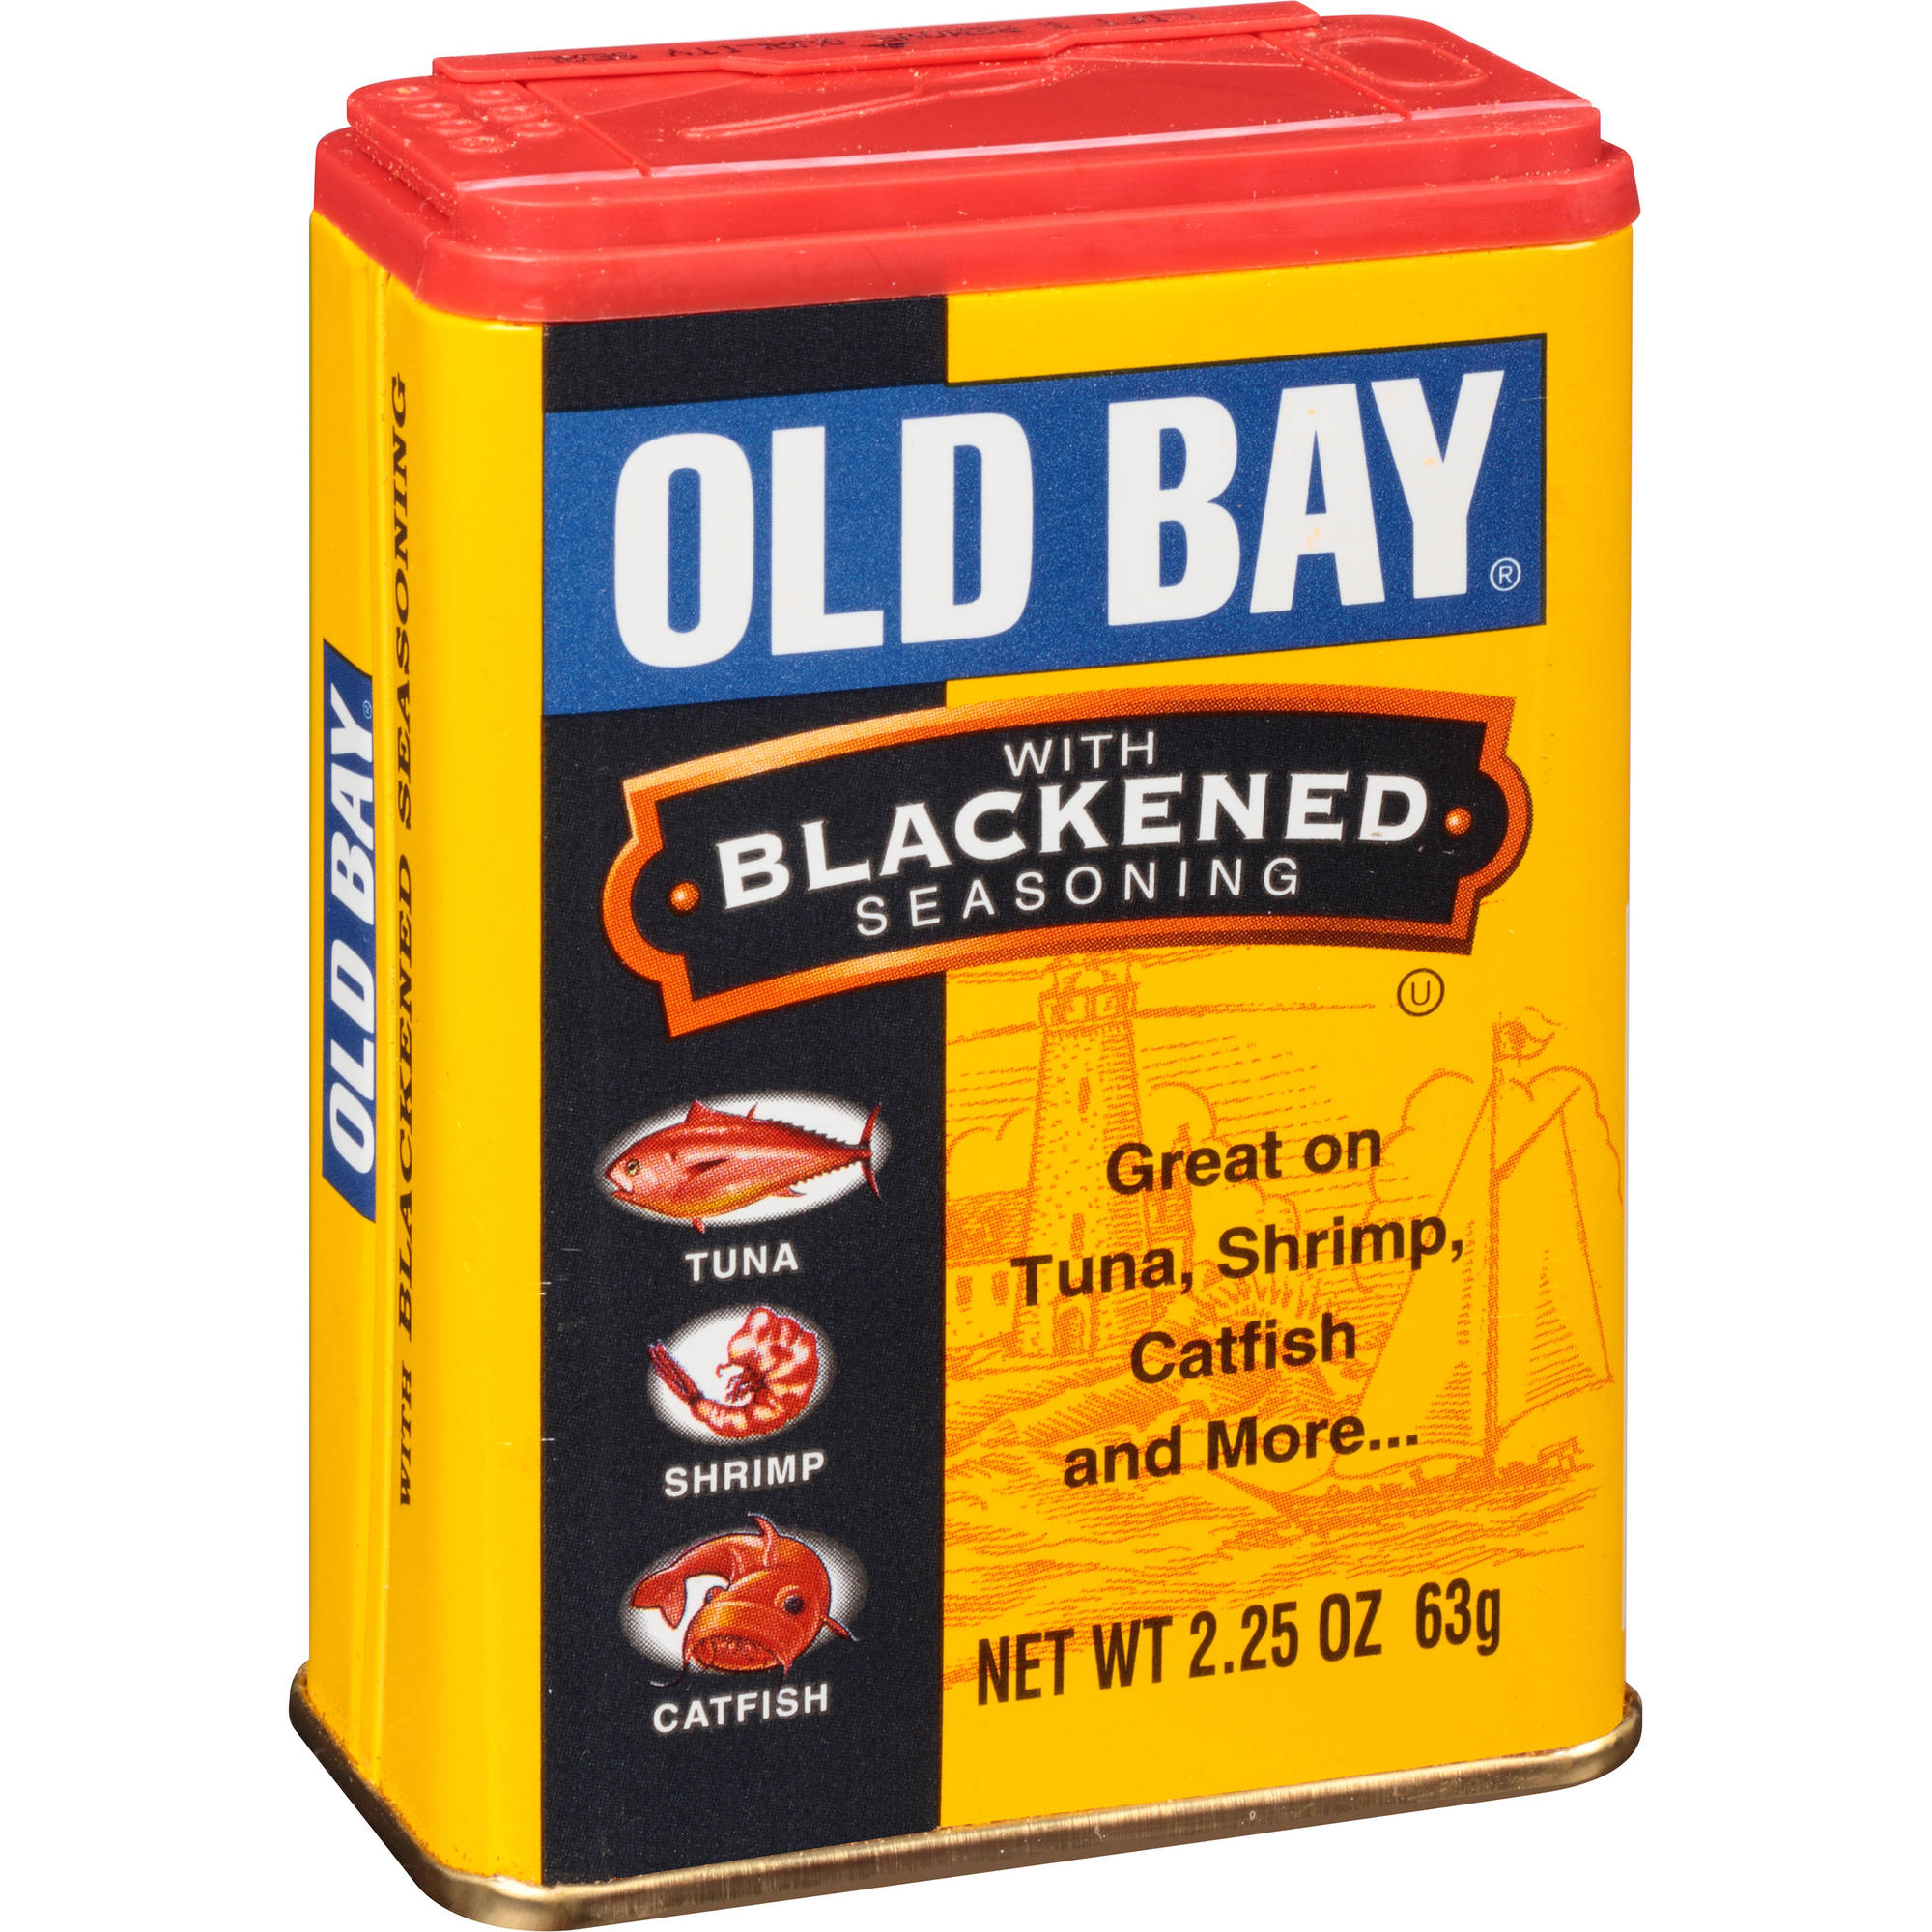 Old Bay with Blackened Seasoning, 2.25 oz